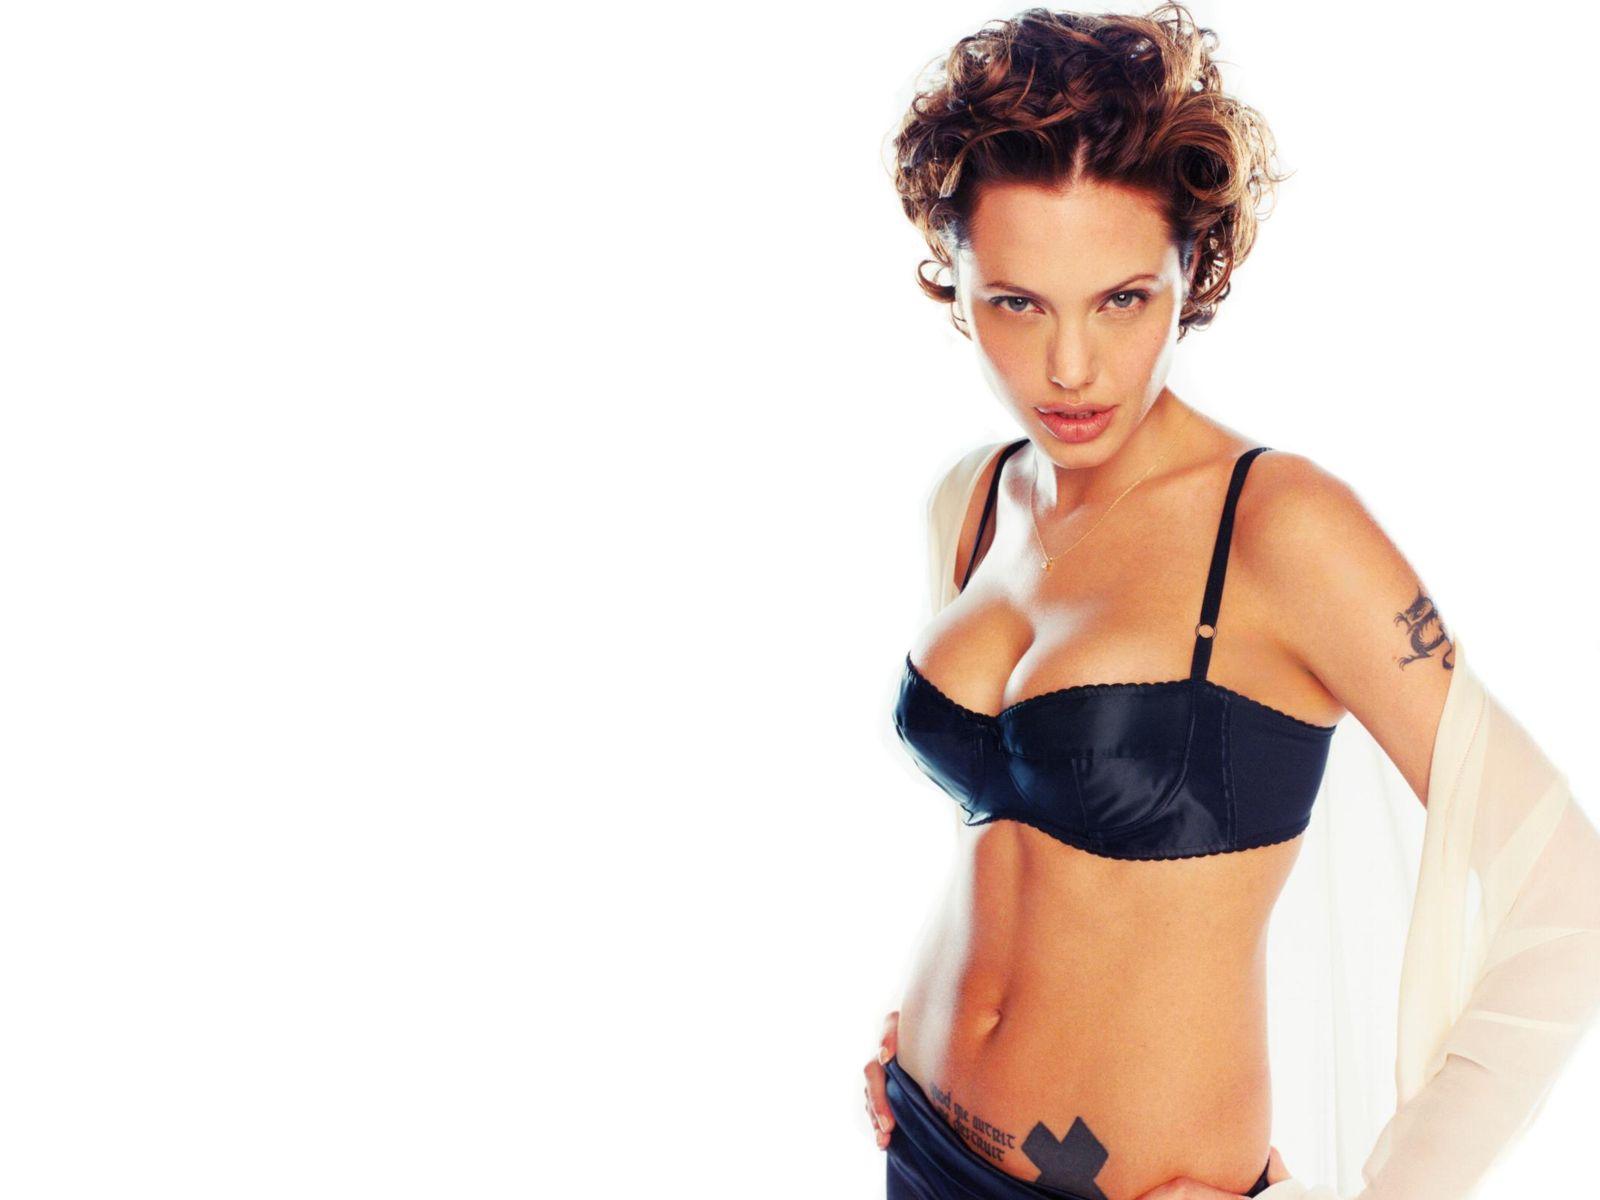 http://4.bp.blogspot.com/-c0SDTXBTWxI/TZOimJpx5EI/AAAAAAAAAlg/dcdOrQALxuE/s1600/Angelina-Jolie+0+%252845%2529.jpg